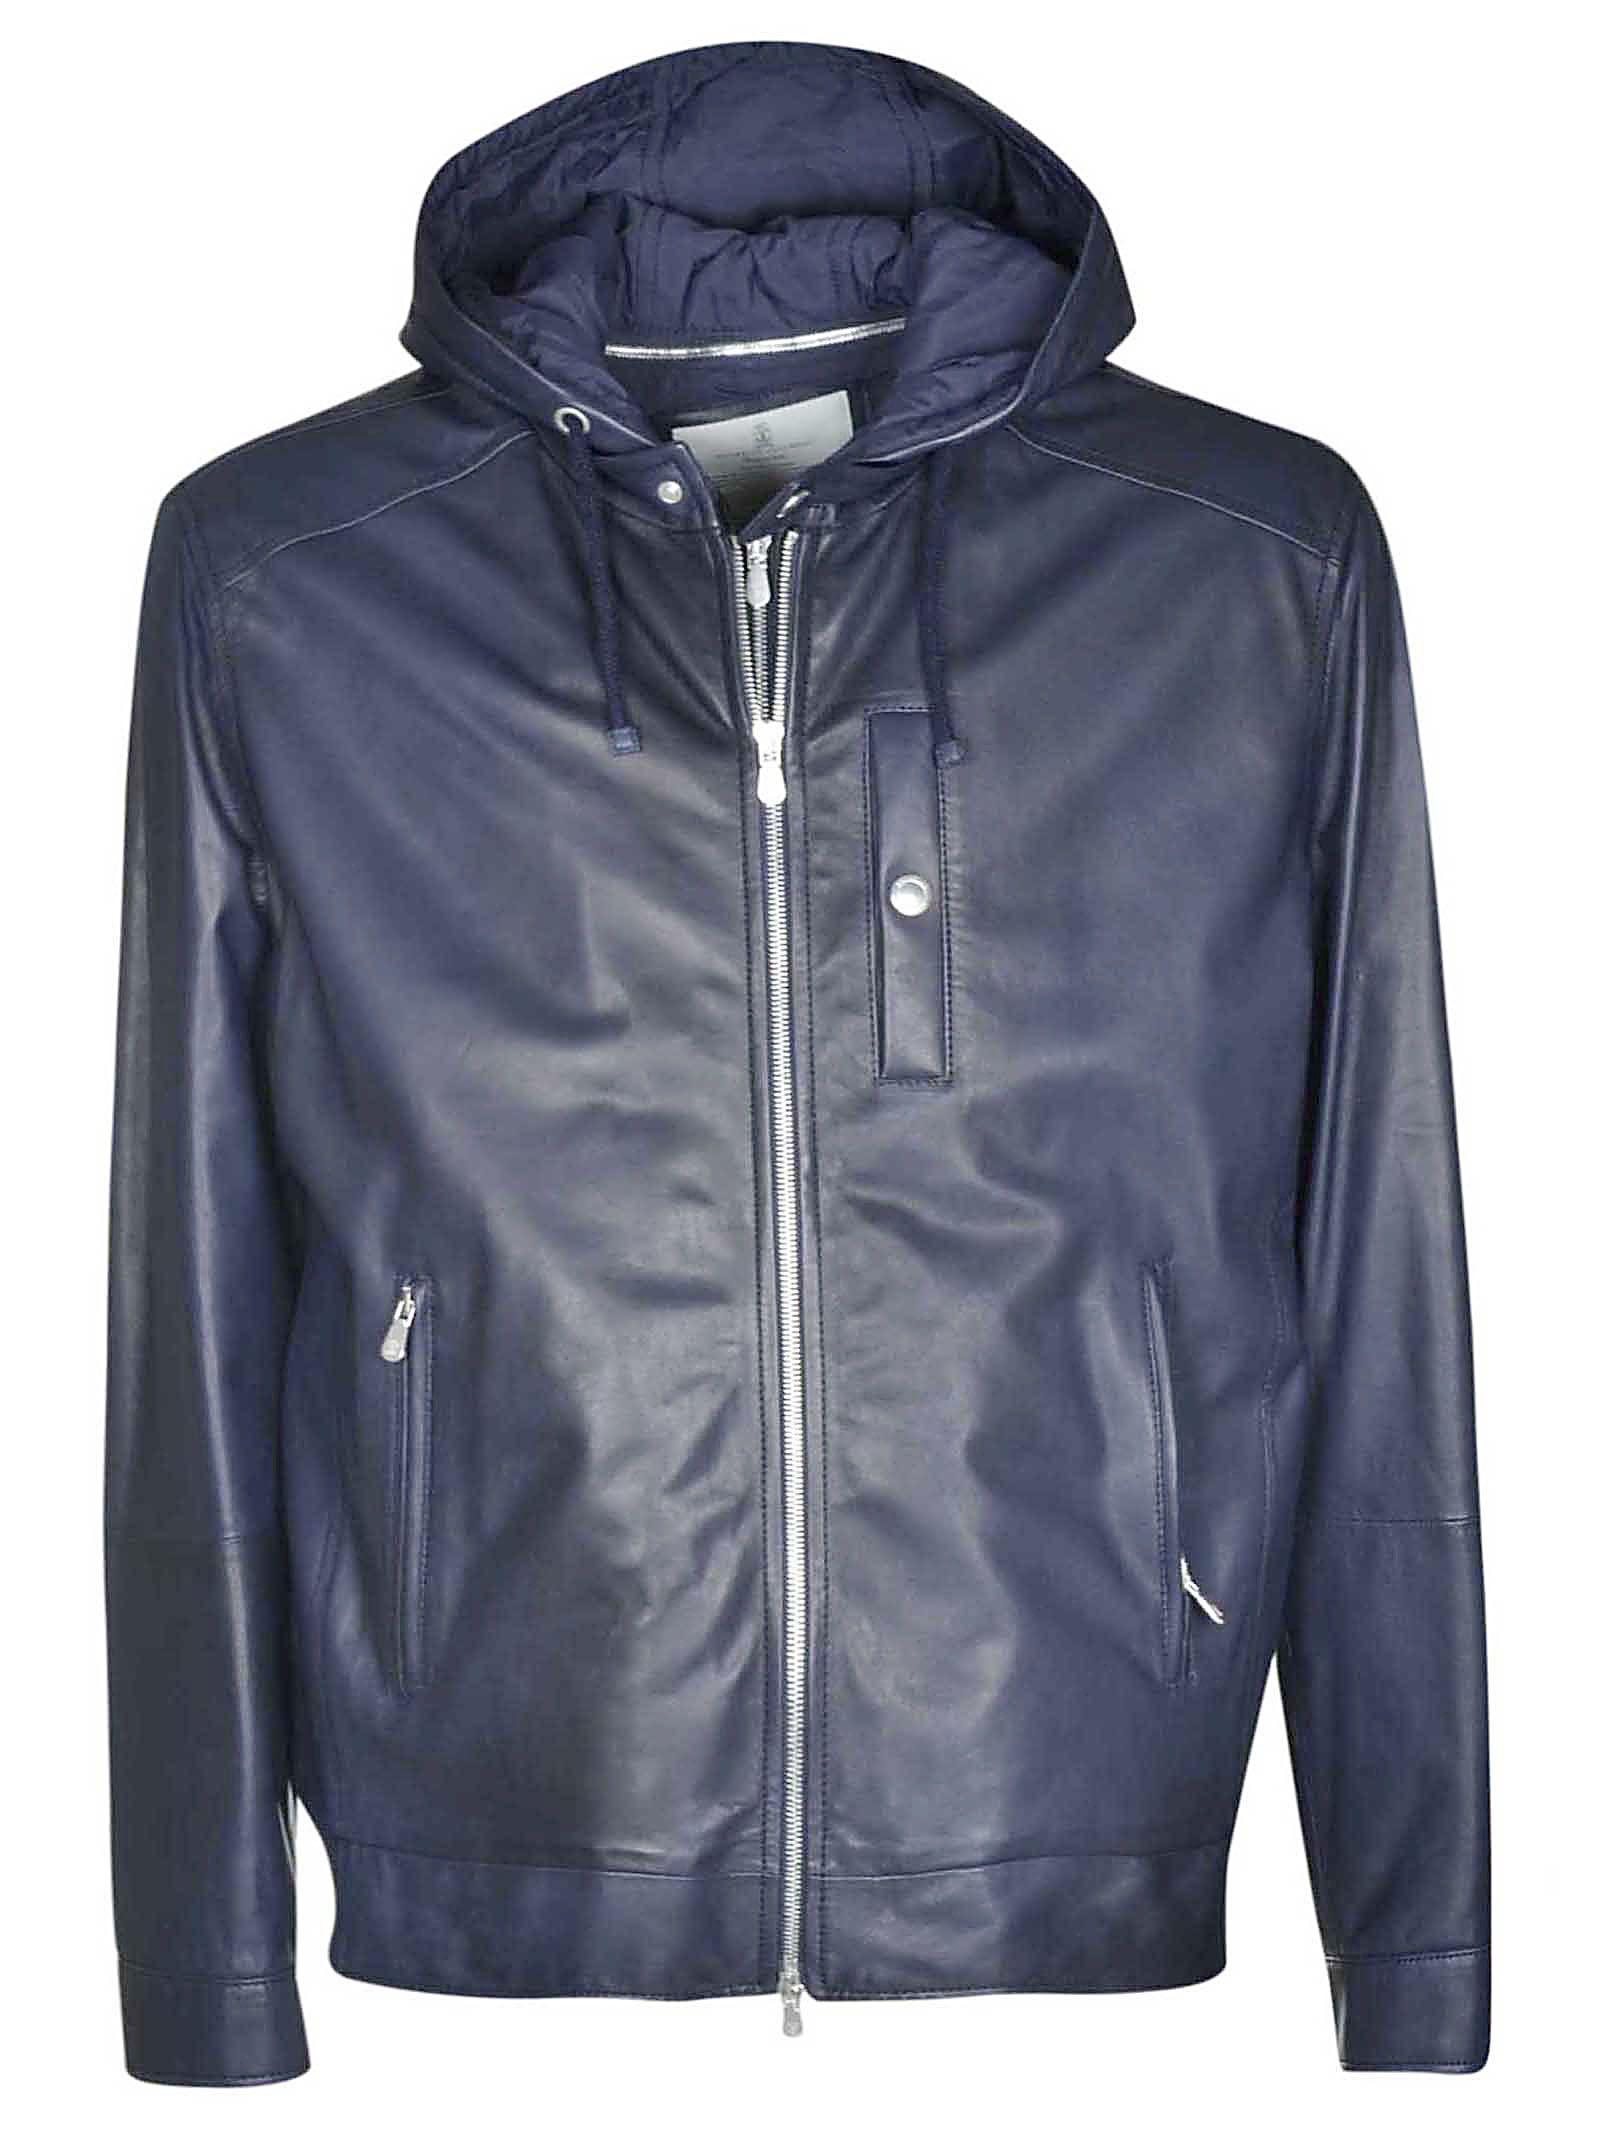 Brunello Cucinelli Leather Hooded Jacket In Blue Modesens Leather Jacket With Hood Hooded Jacket Jackets [ 2136 x 1600 Pixel ]